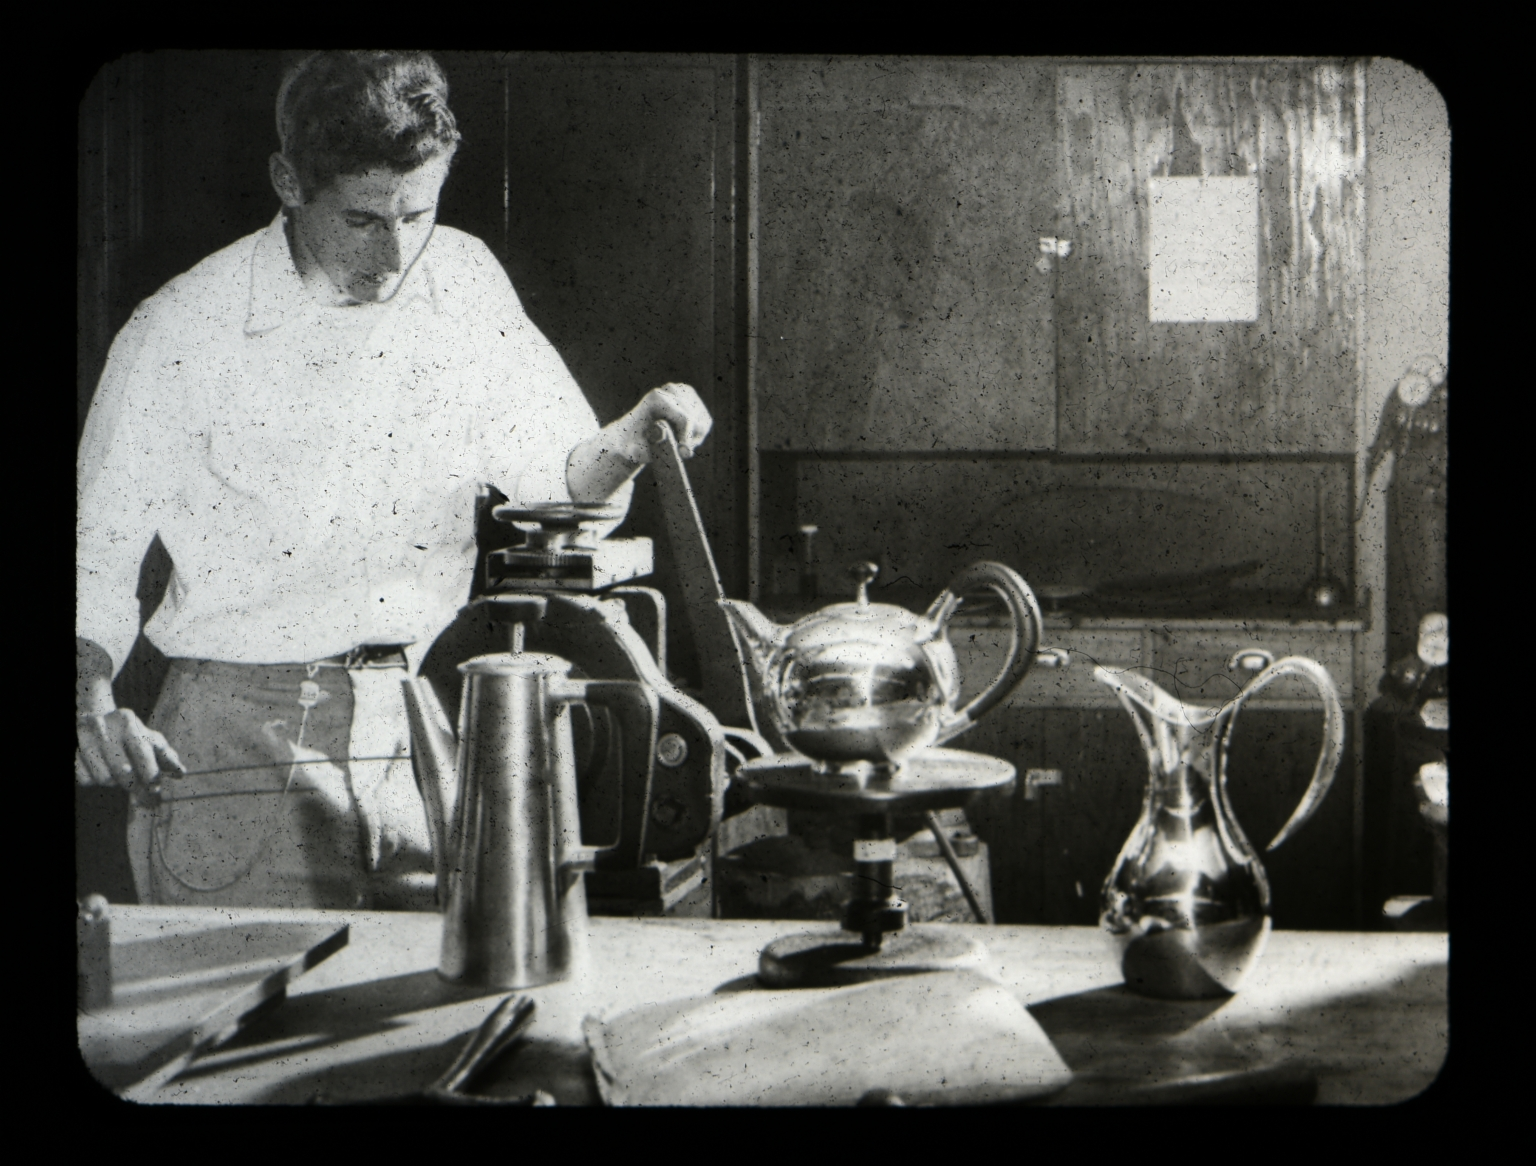 Silversmithing student